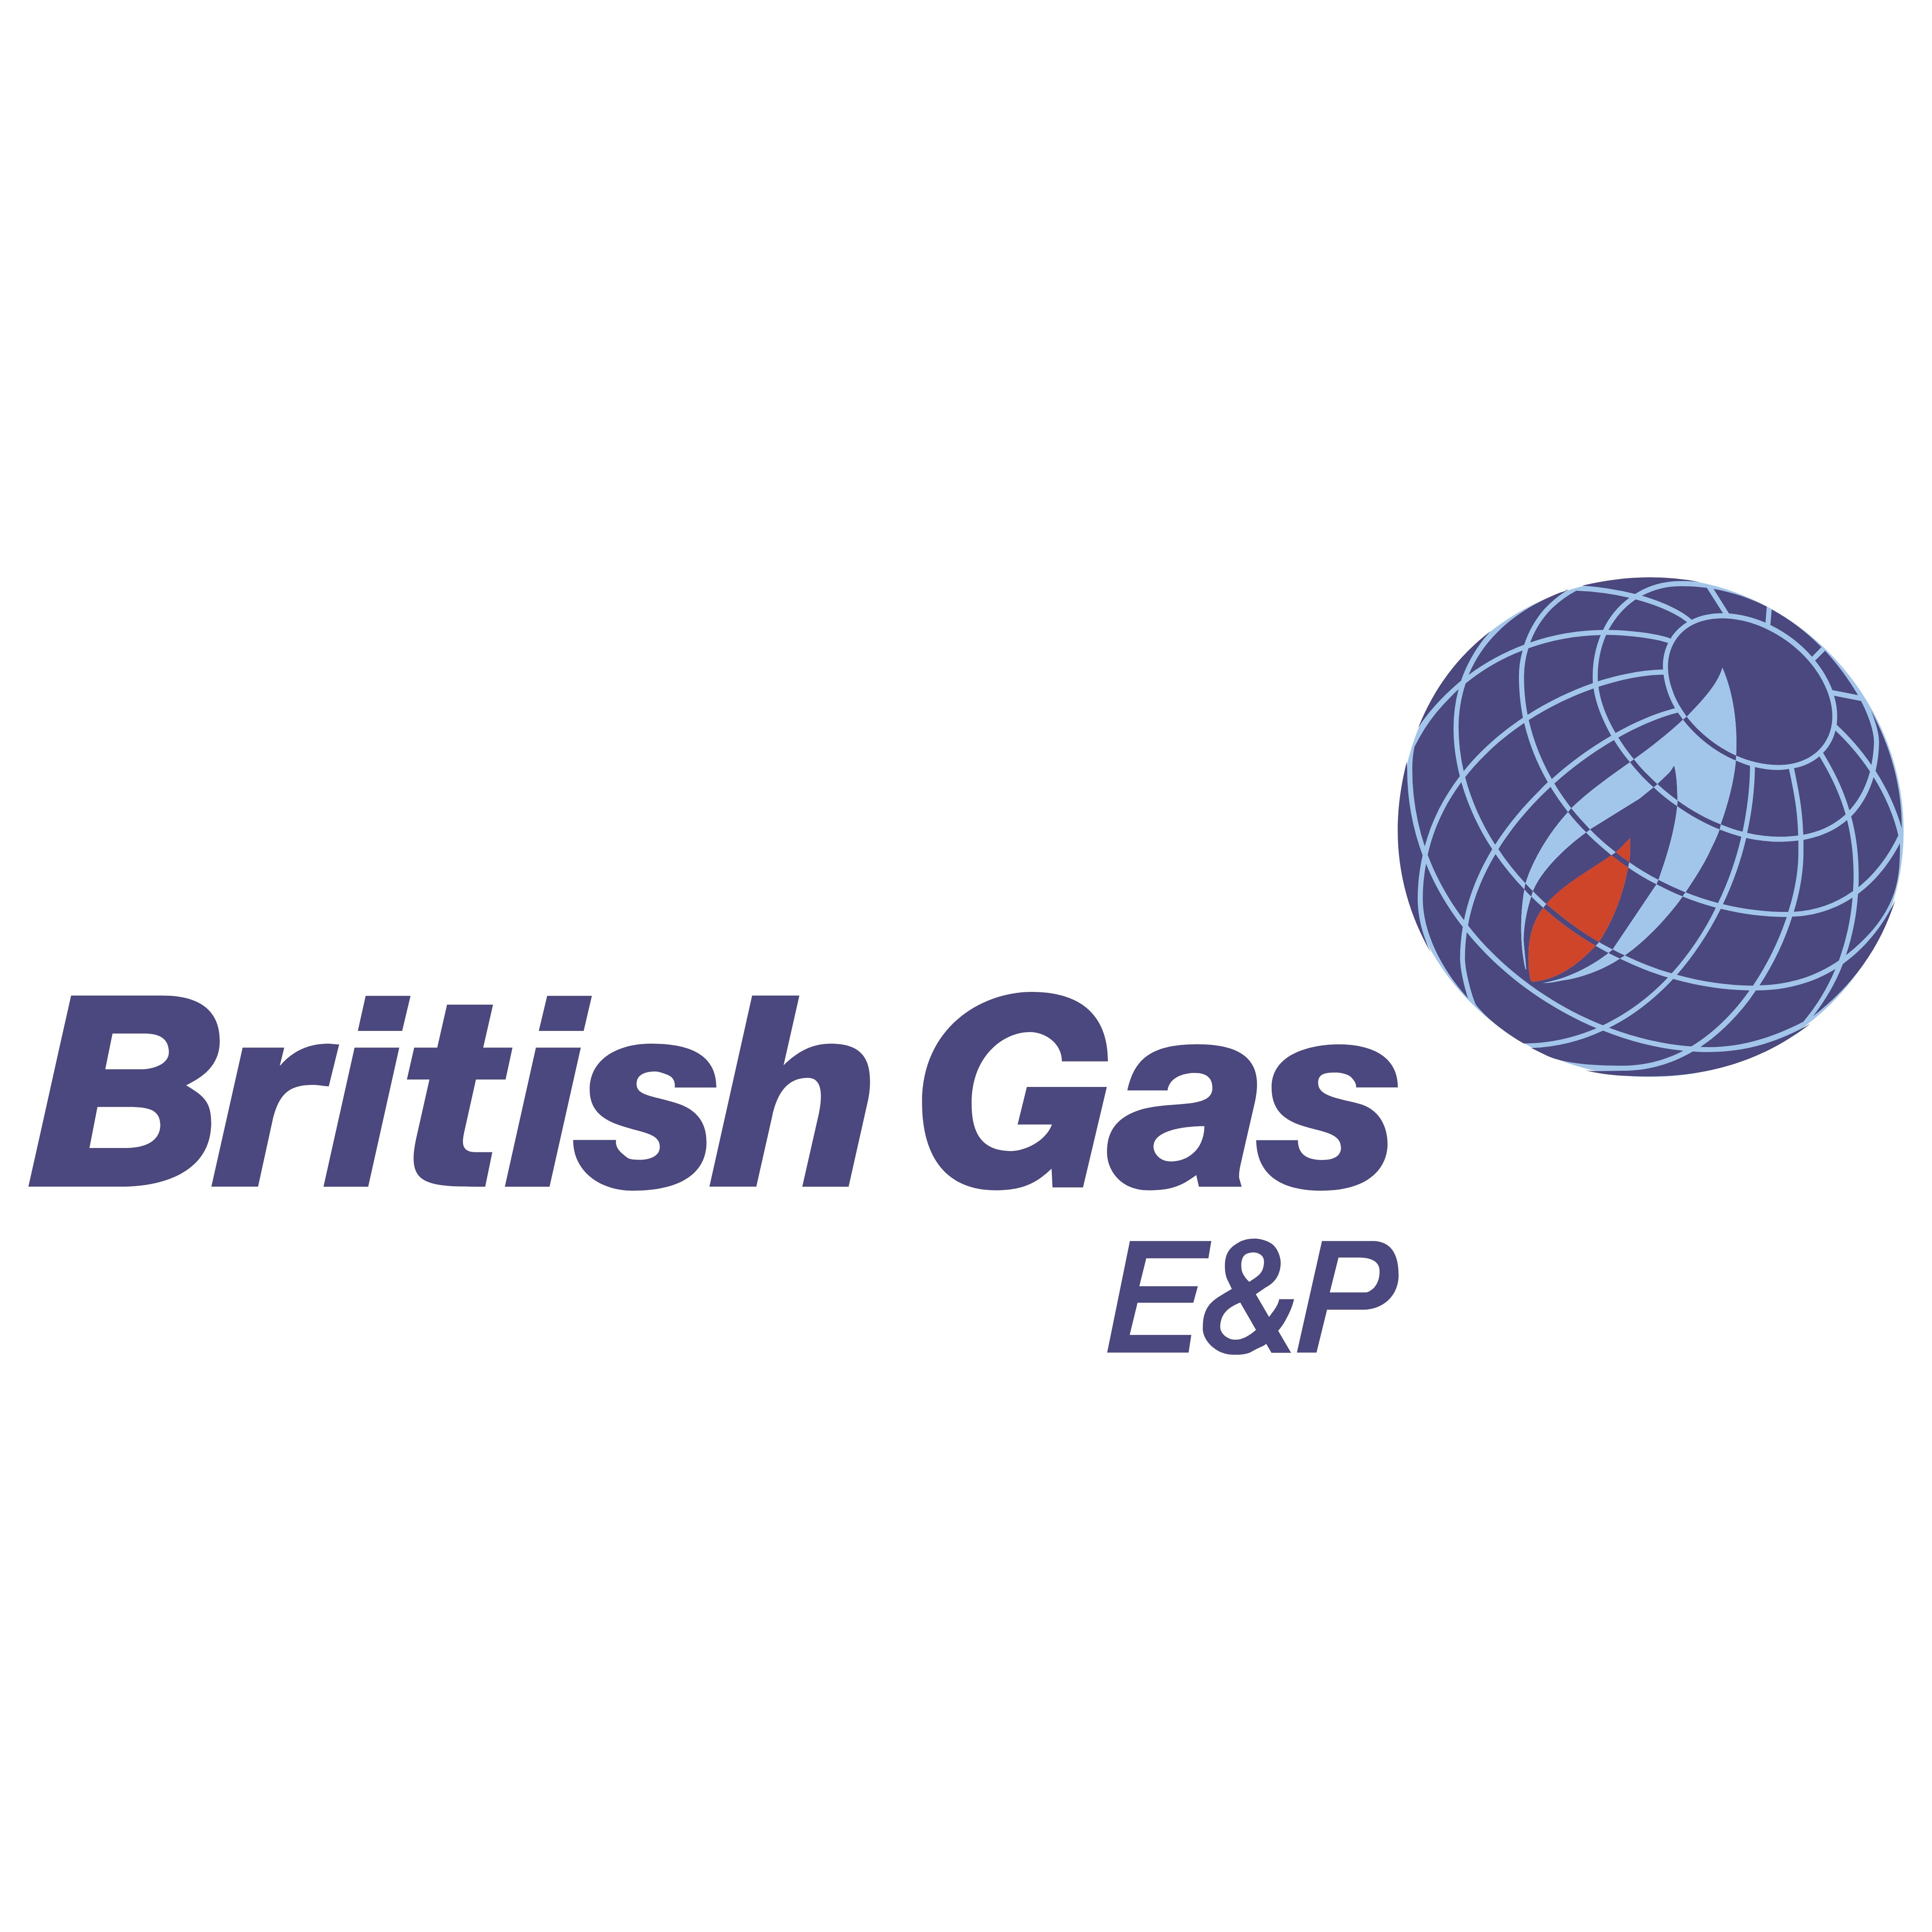 british gas Contents[show] 1986 - 1995 1995 - 2011 2012 - present see also scottish gas.